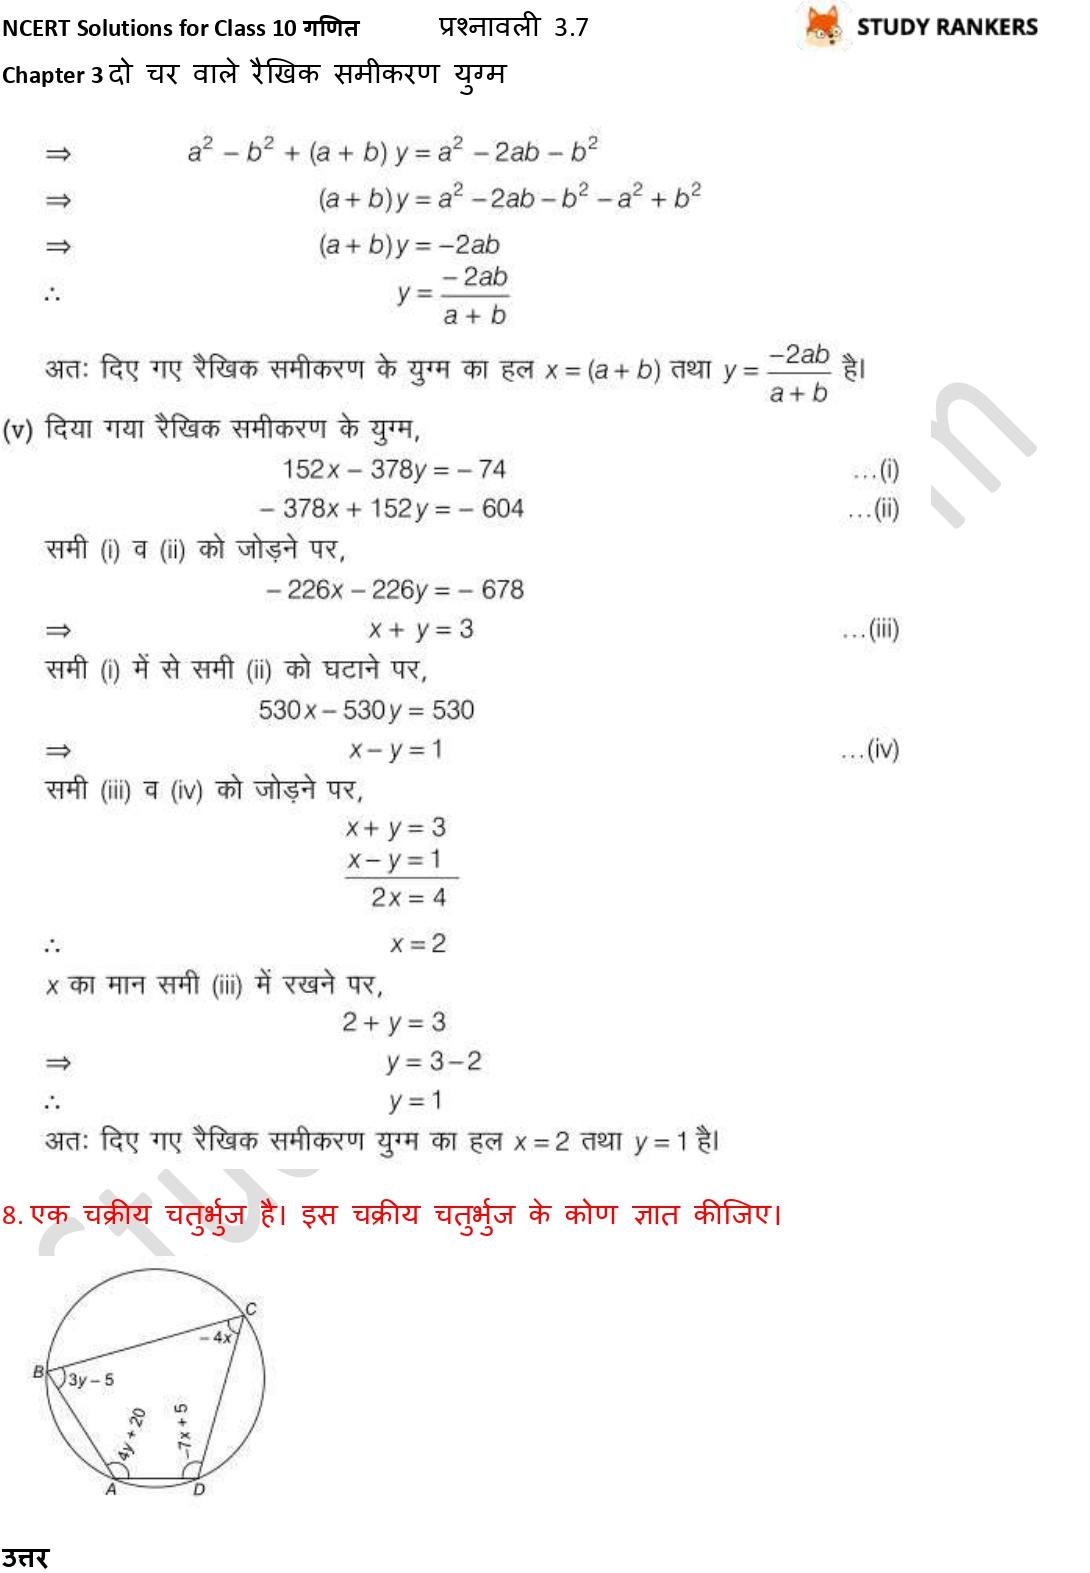 NCERT Solutions for Class 10 Maths Chapter 3 दो चर वाले रैखिक समीकरण युग्म प्रश्नावली 3.7 Part 11